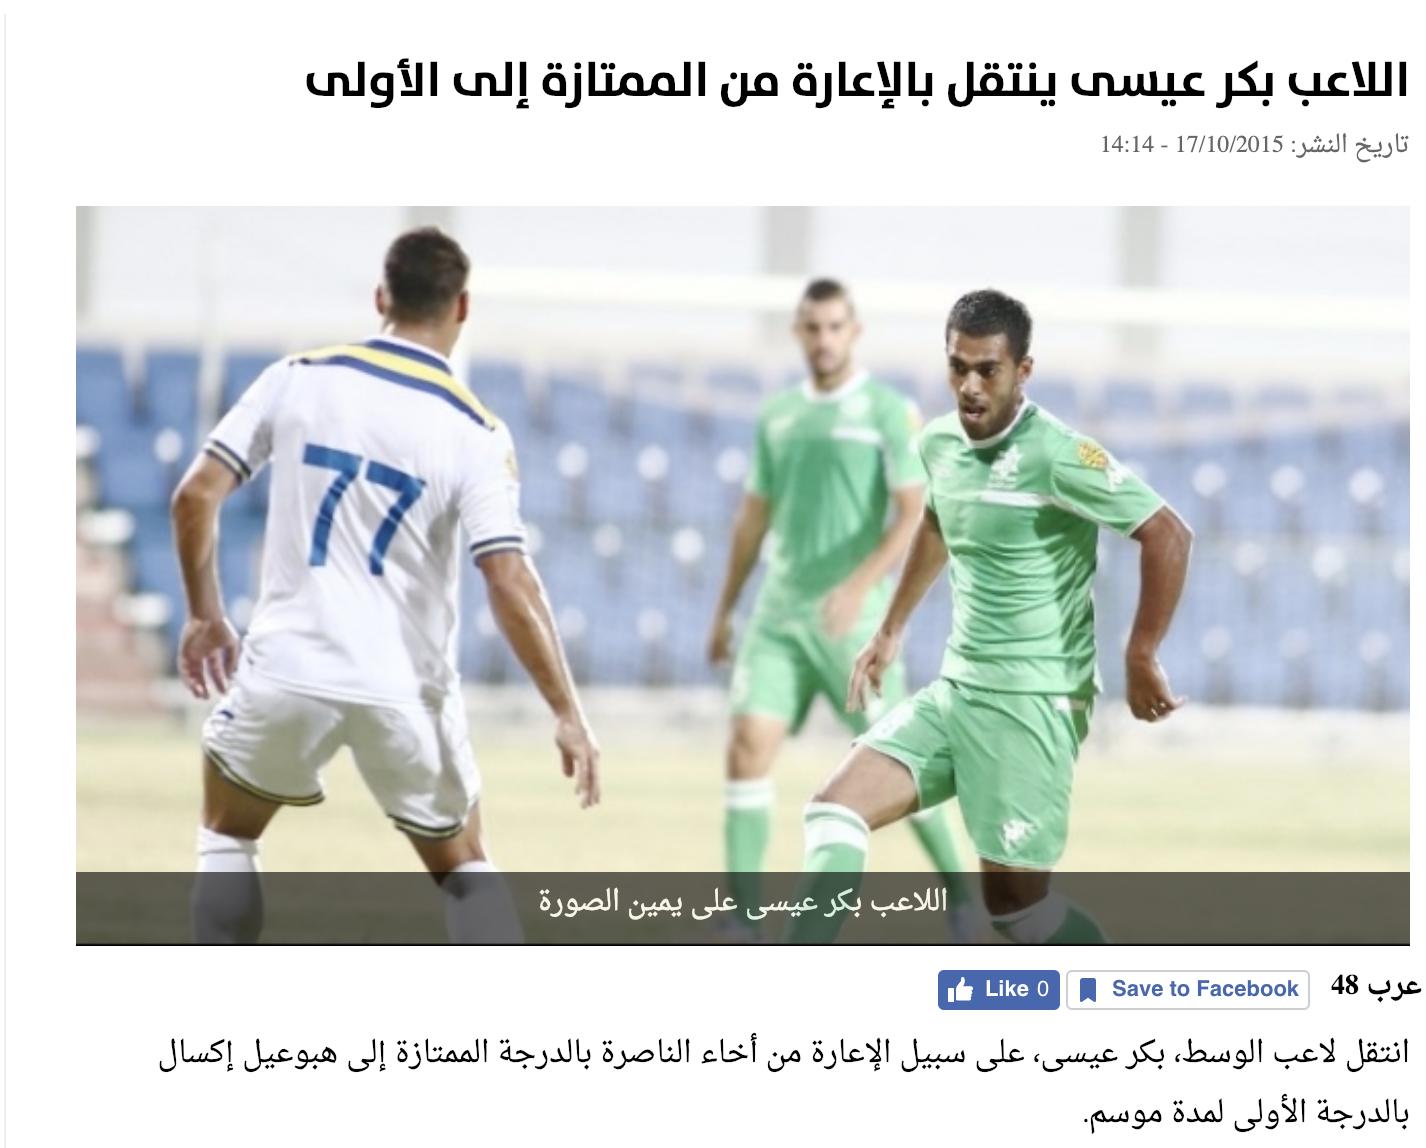 The Nasrawy Bakr Eissa in an article back in 2015 (Screenshot)